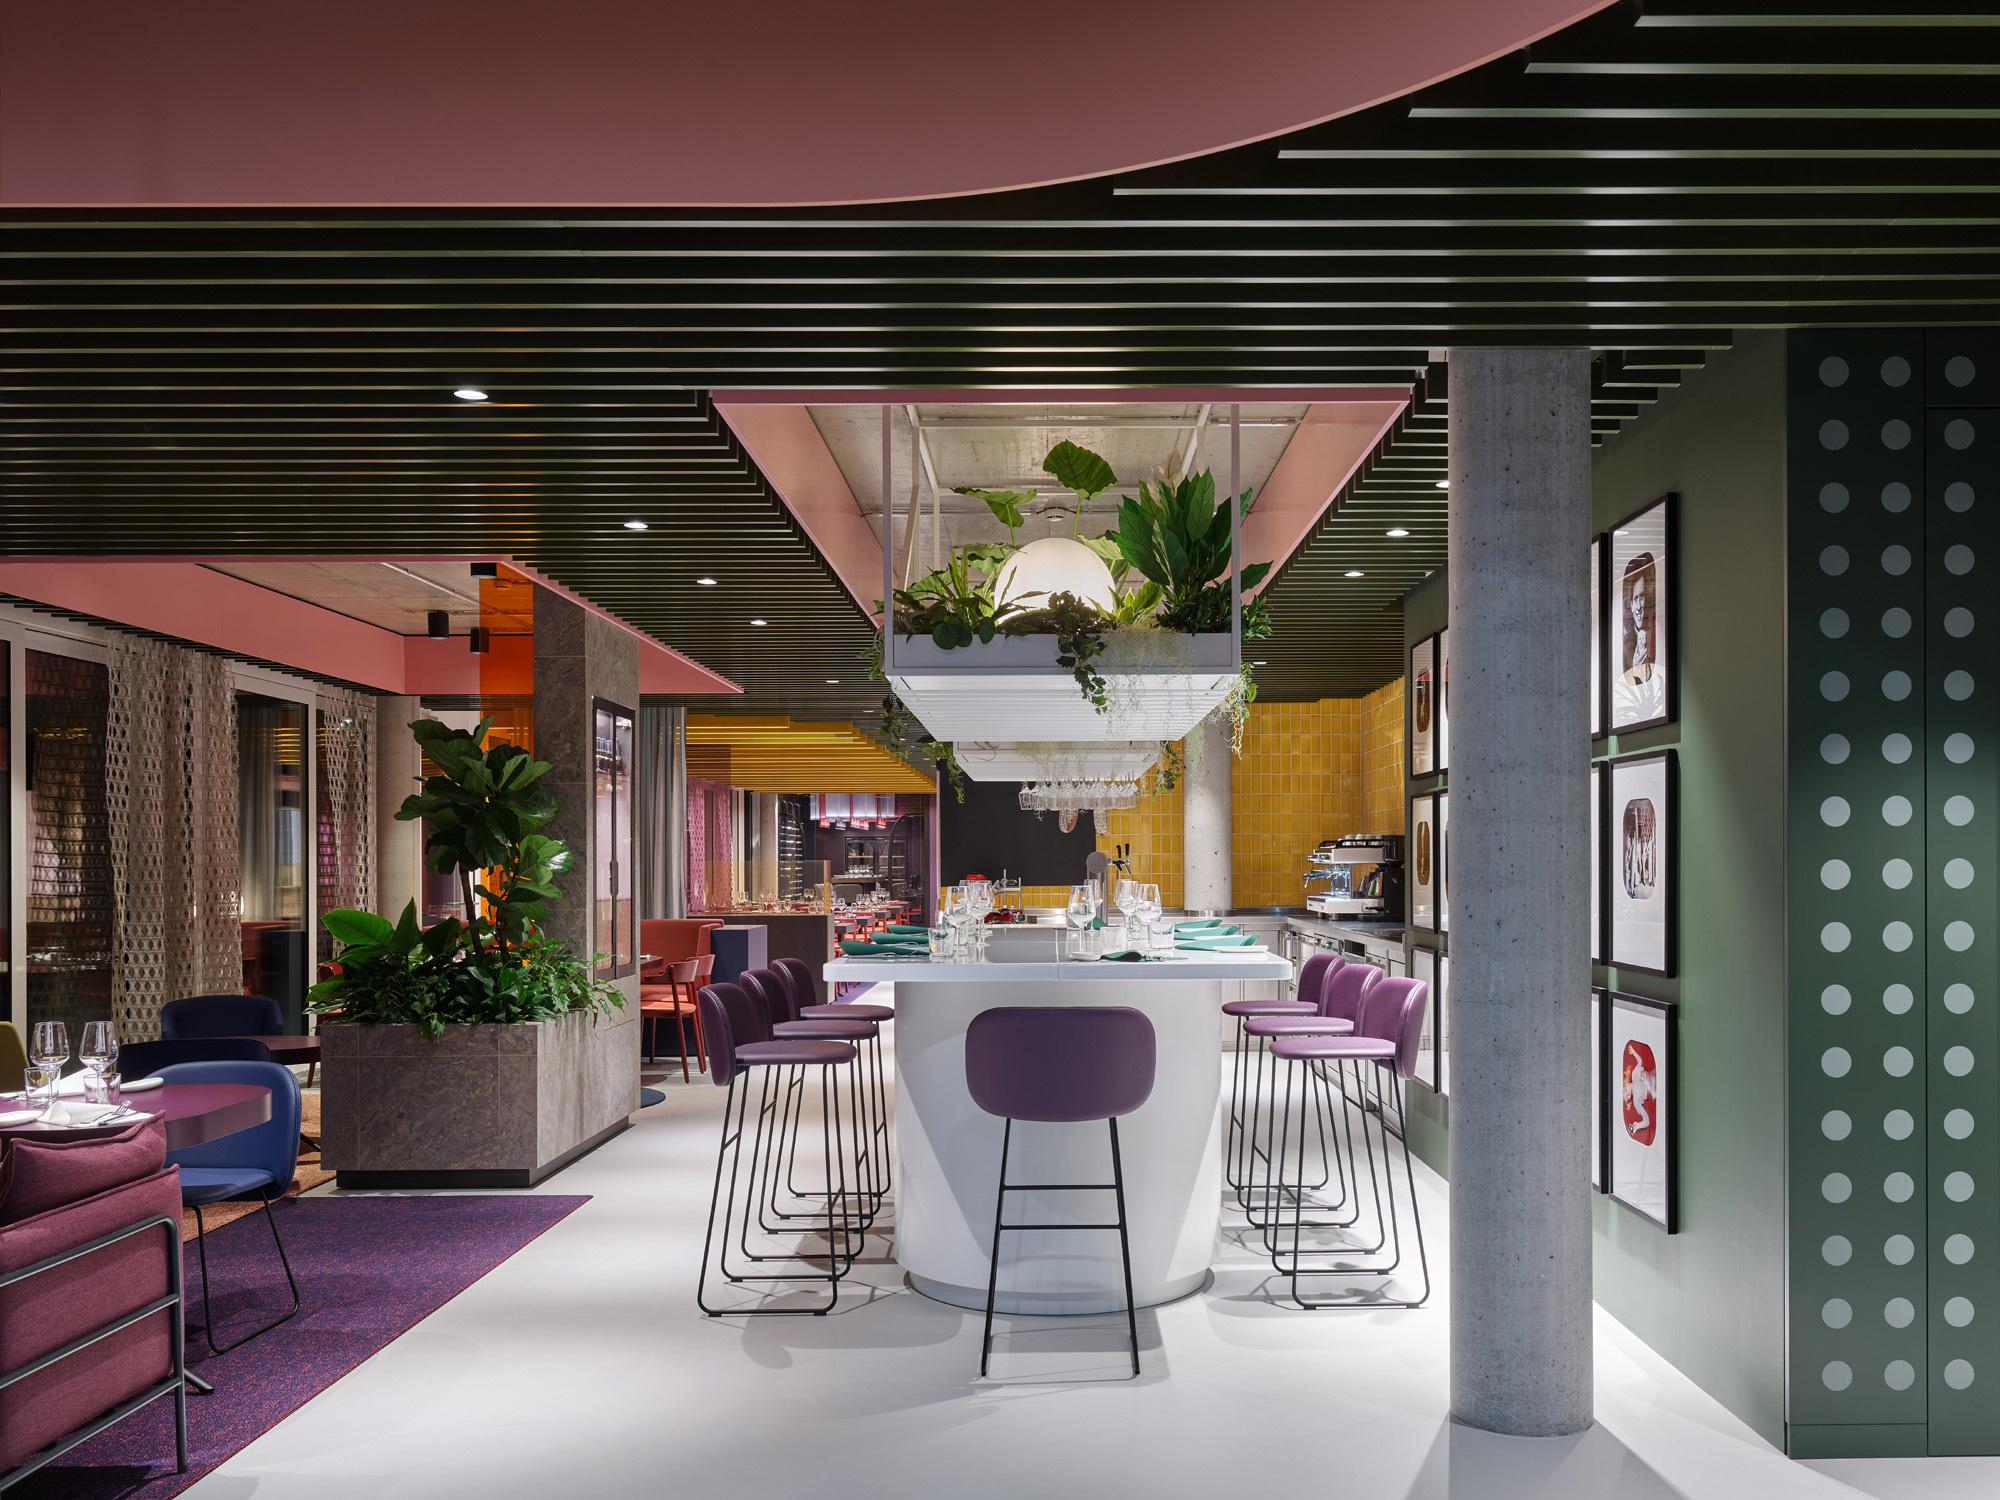 La Visione – Object Carpet Restaurant, Foto: Zooey Braun